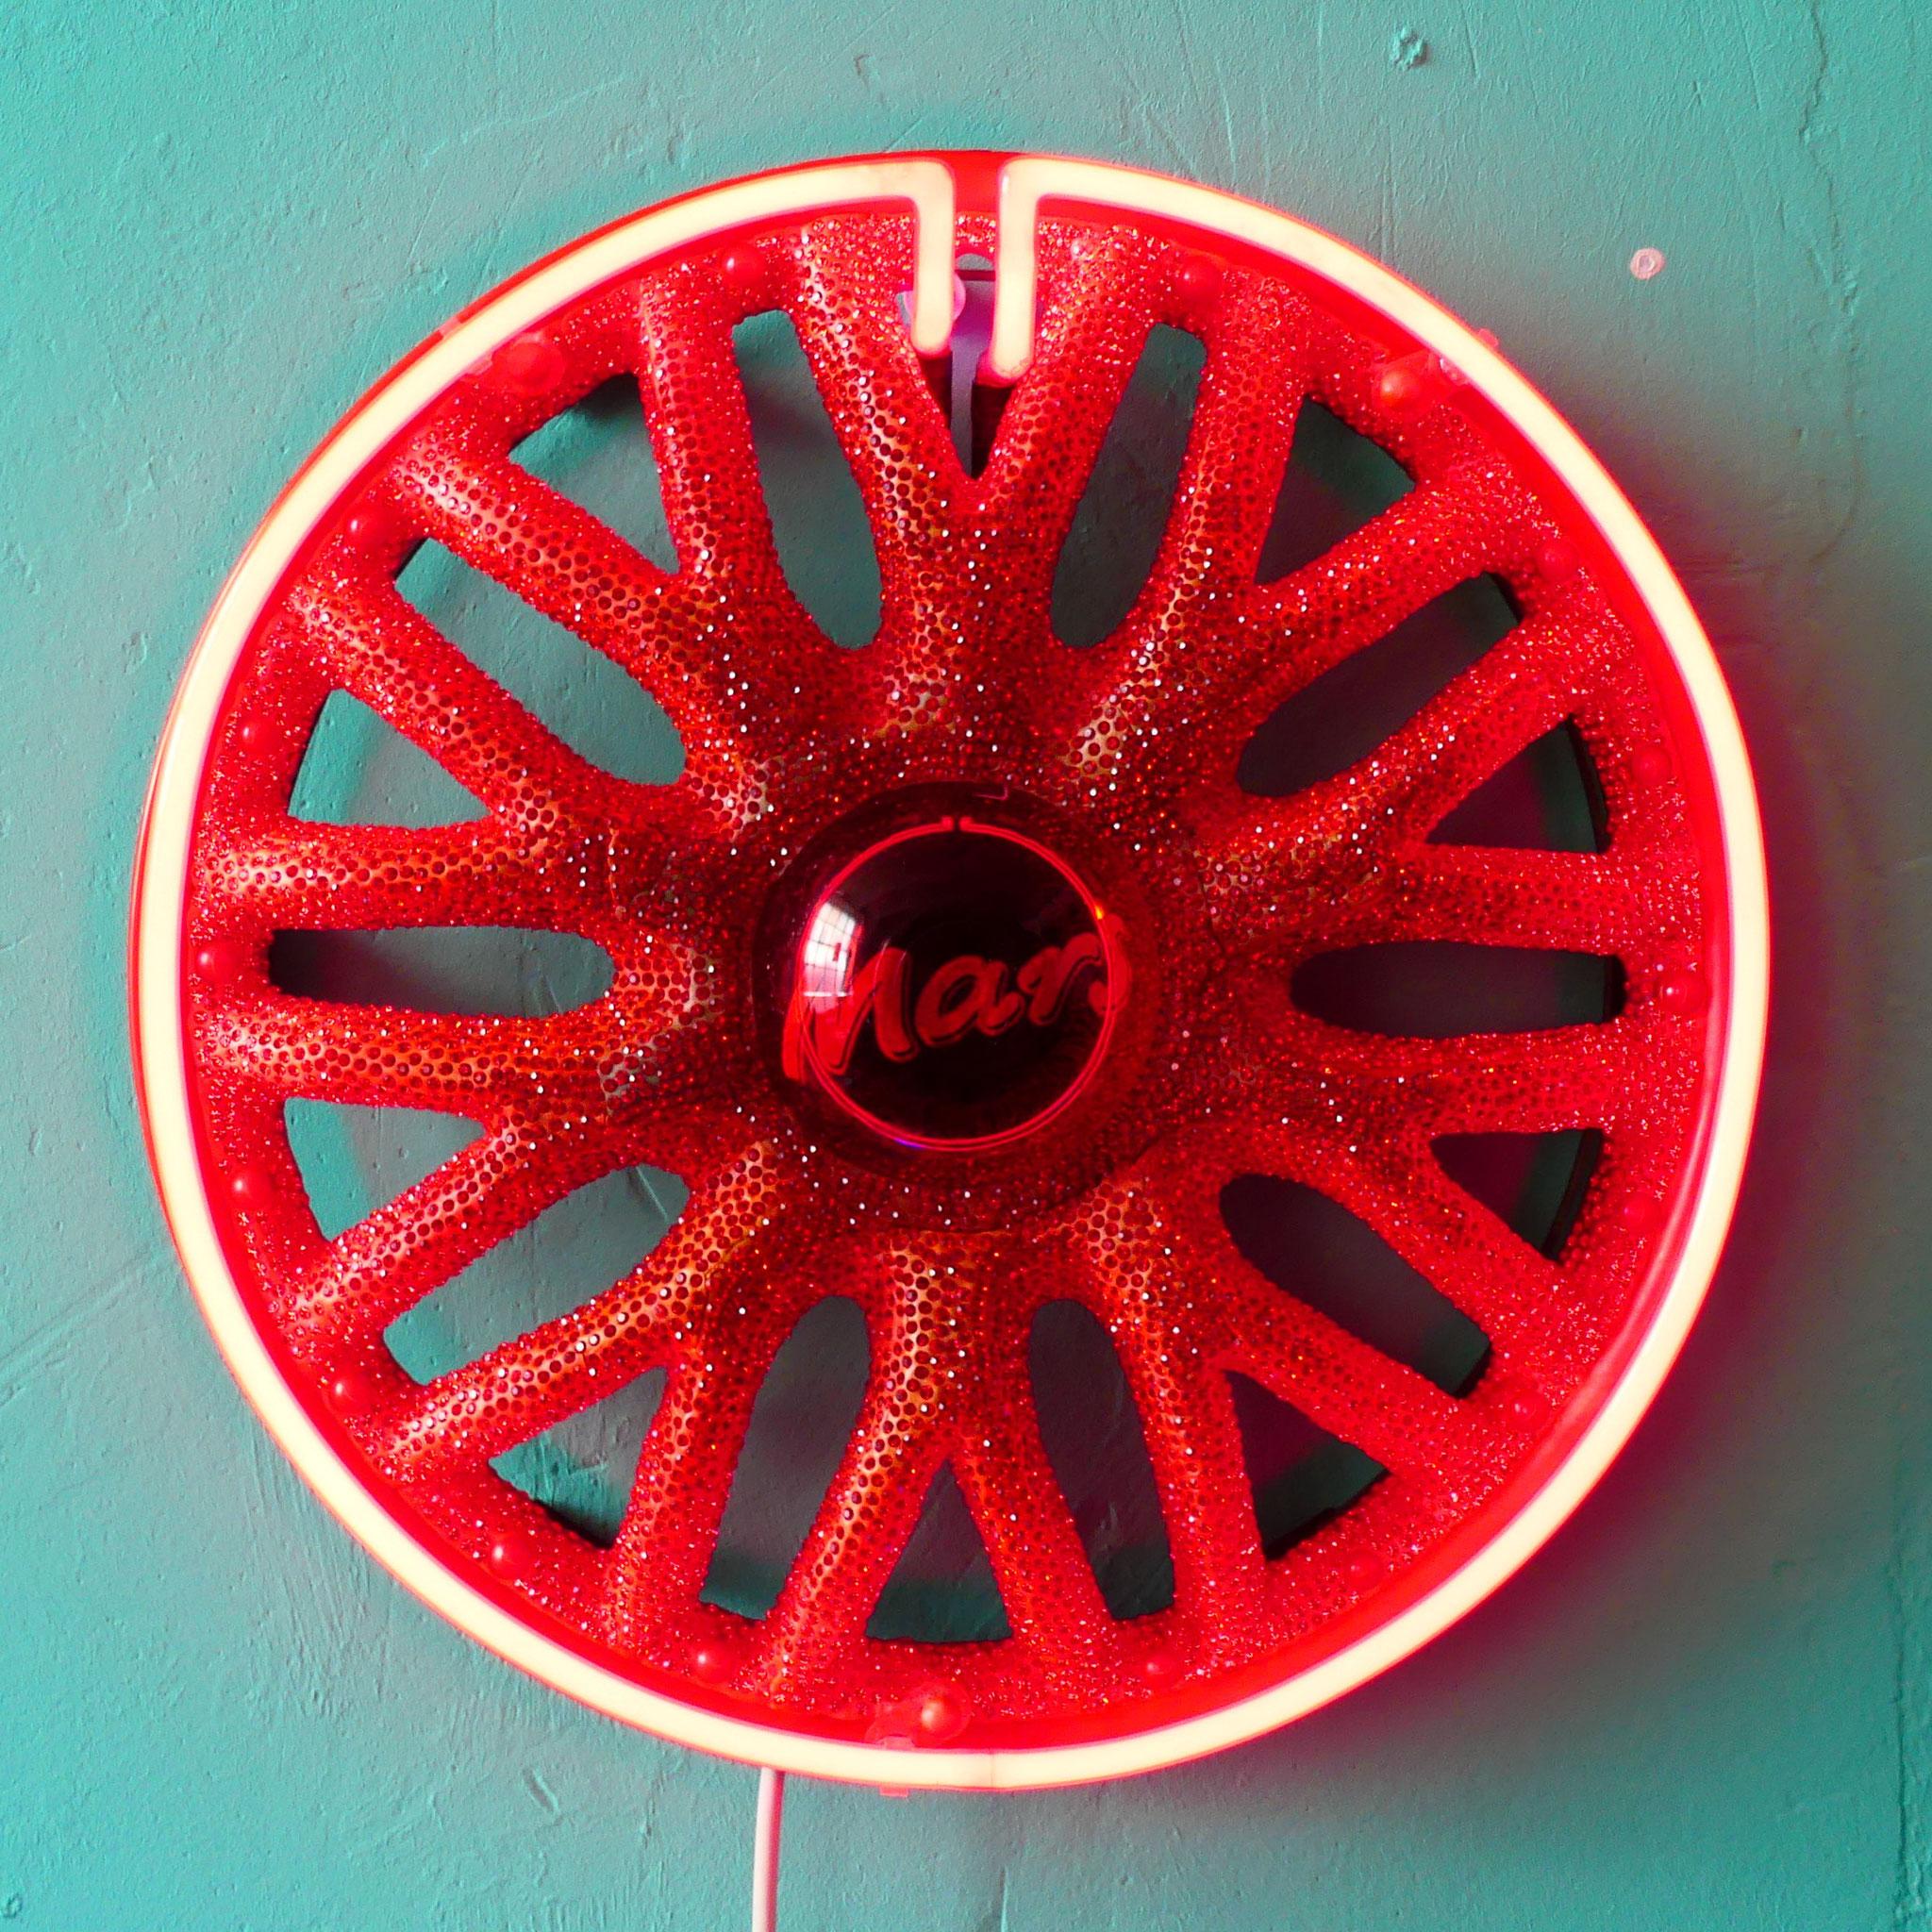 MARS Wheel Cover, Modelling Compount,  Rhinestones, Acrylic Pigment, Neon Light